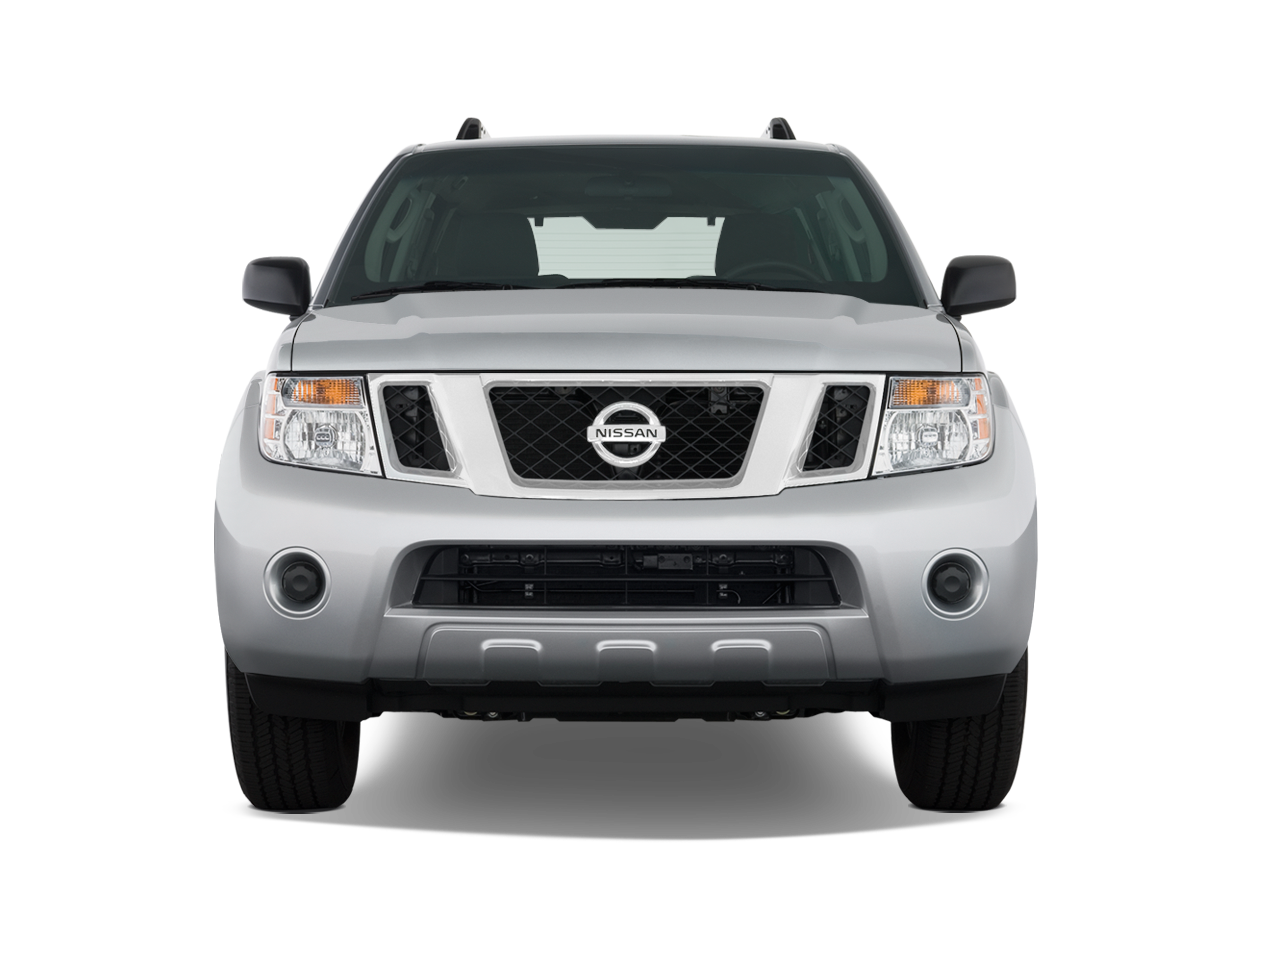 Nissan Frontier Review >> 2009 Nissan Pathfinder LE 4x4 - Nissan Midsize SUV Review - Automobile Magazine